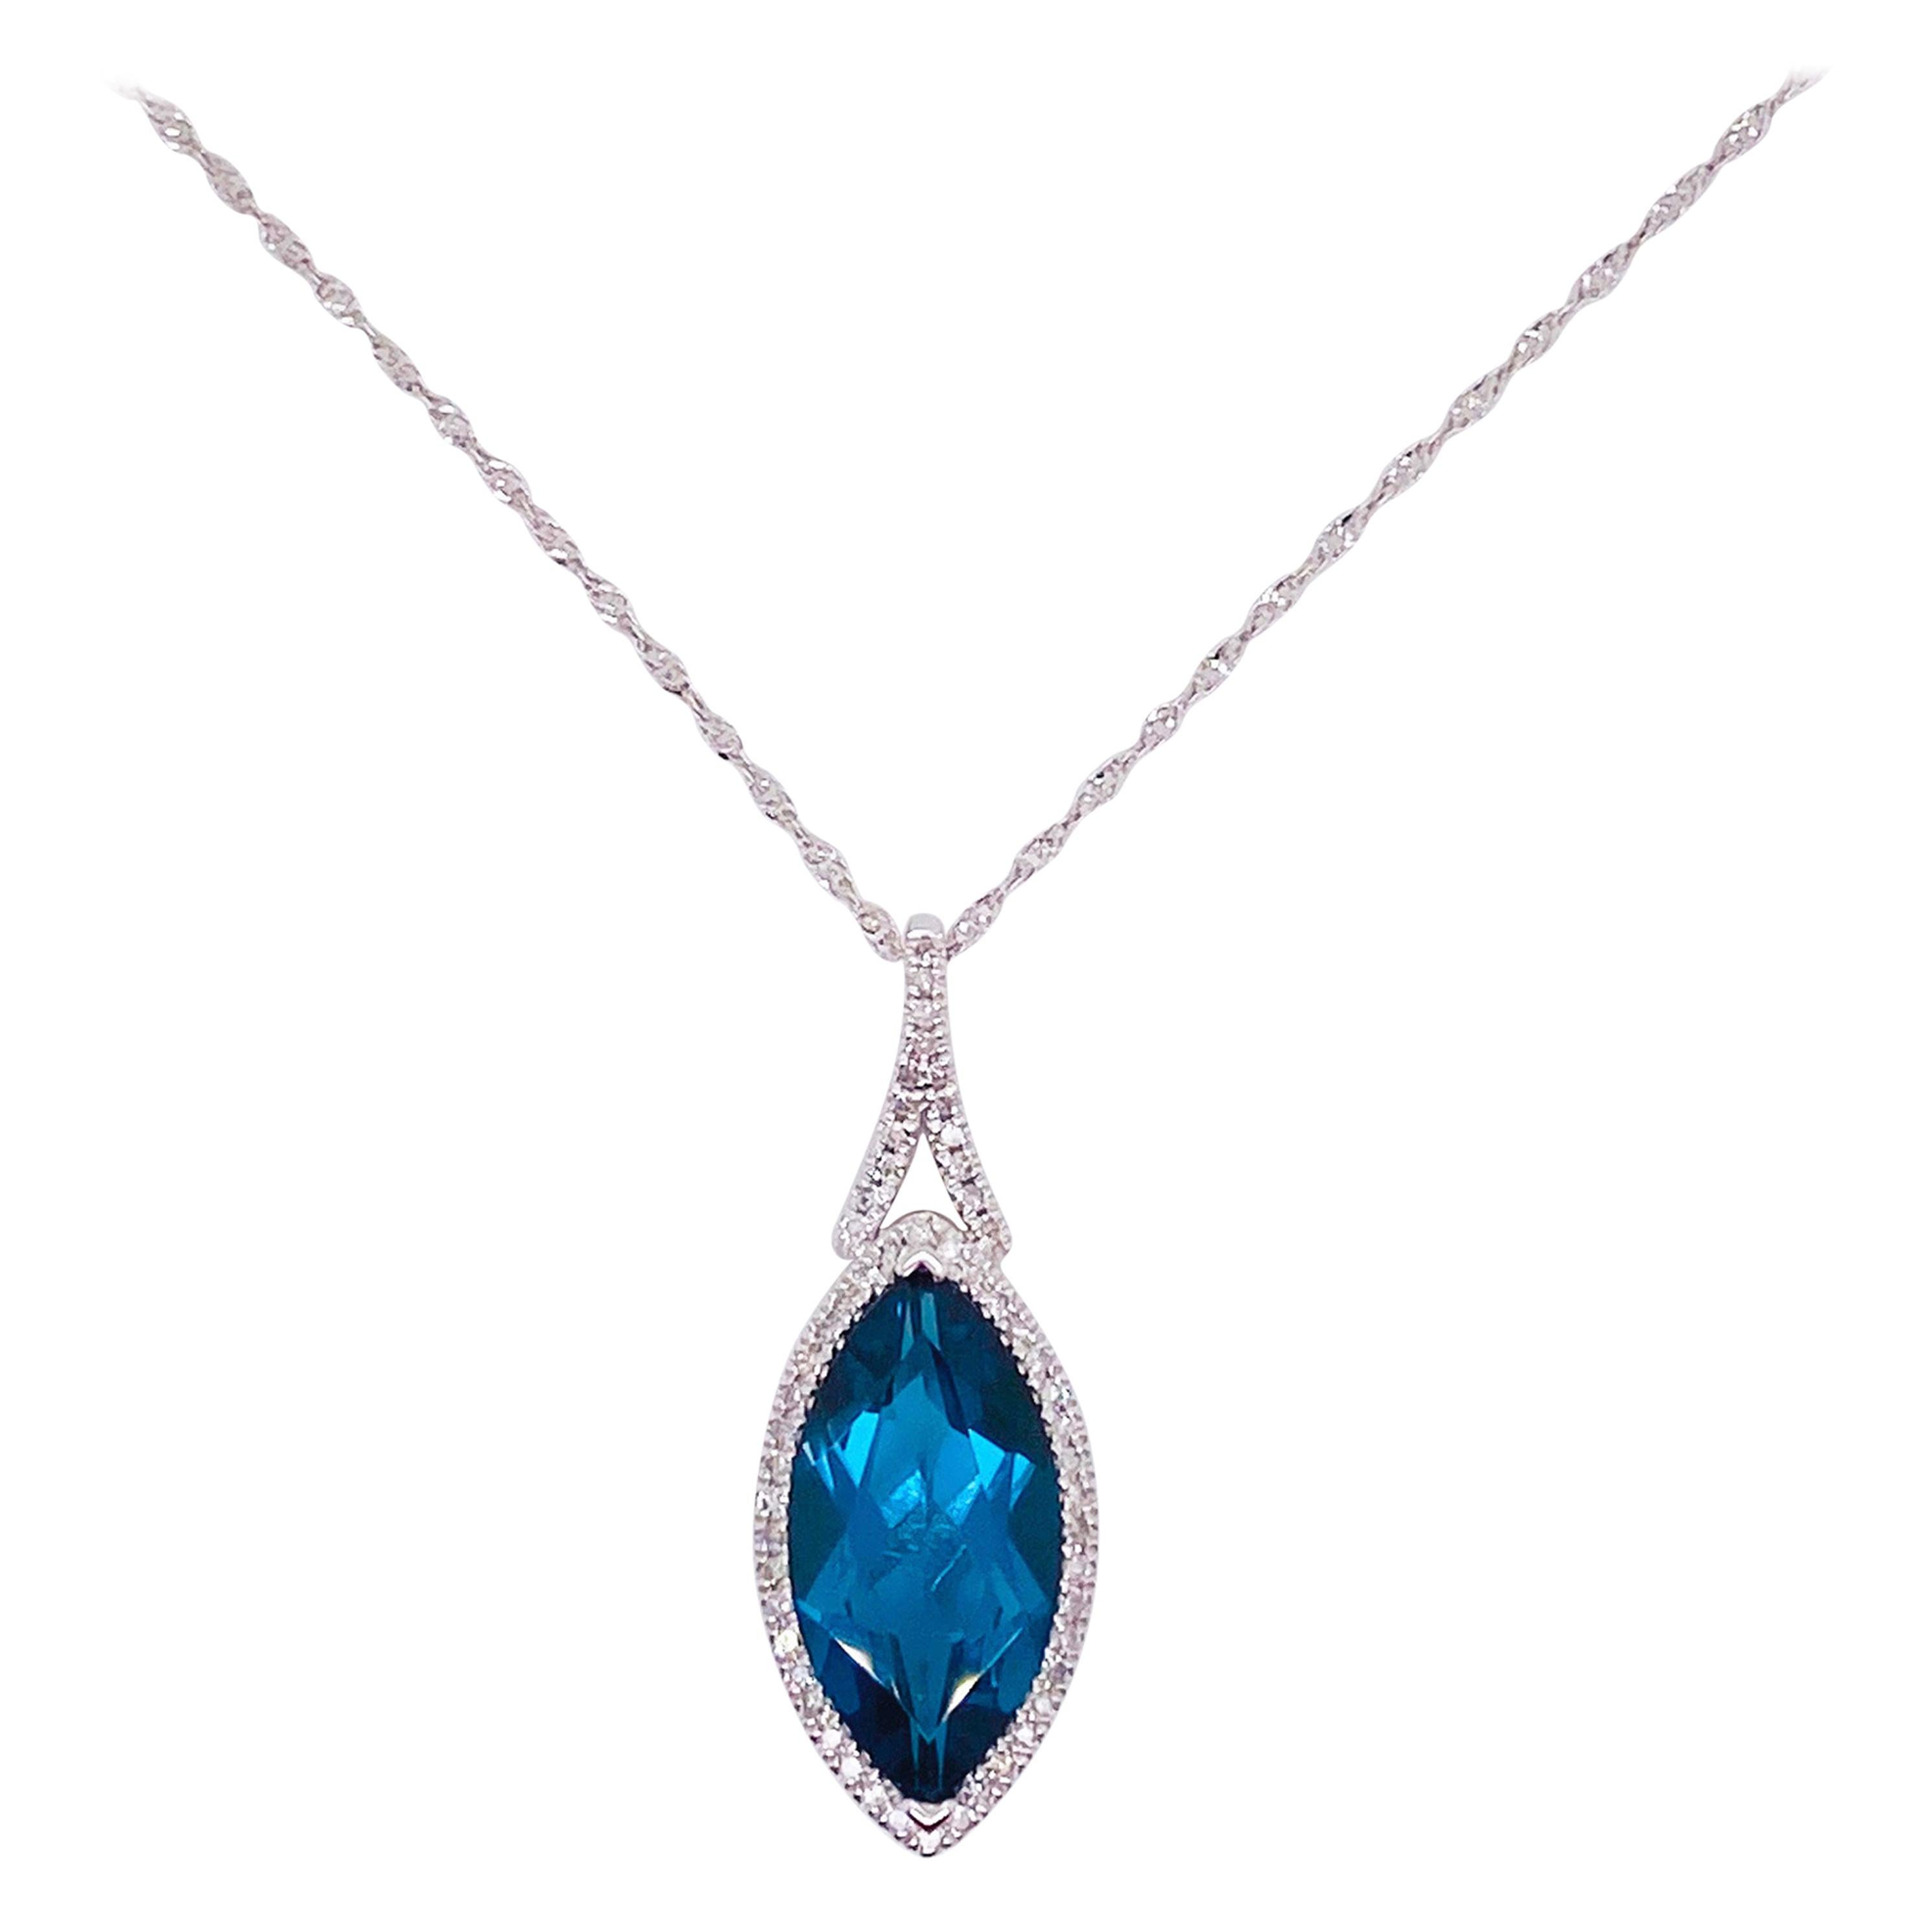 4 Carat London Blue Topaz & Diamond Halo Pendant 14 Karat Gold Marquise Necklace